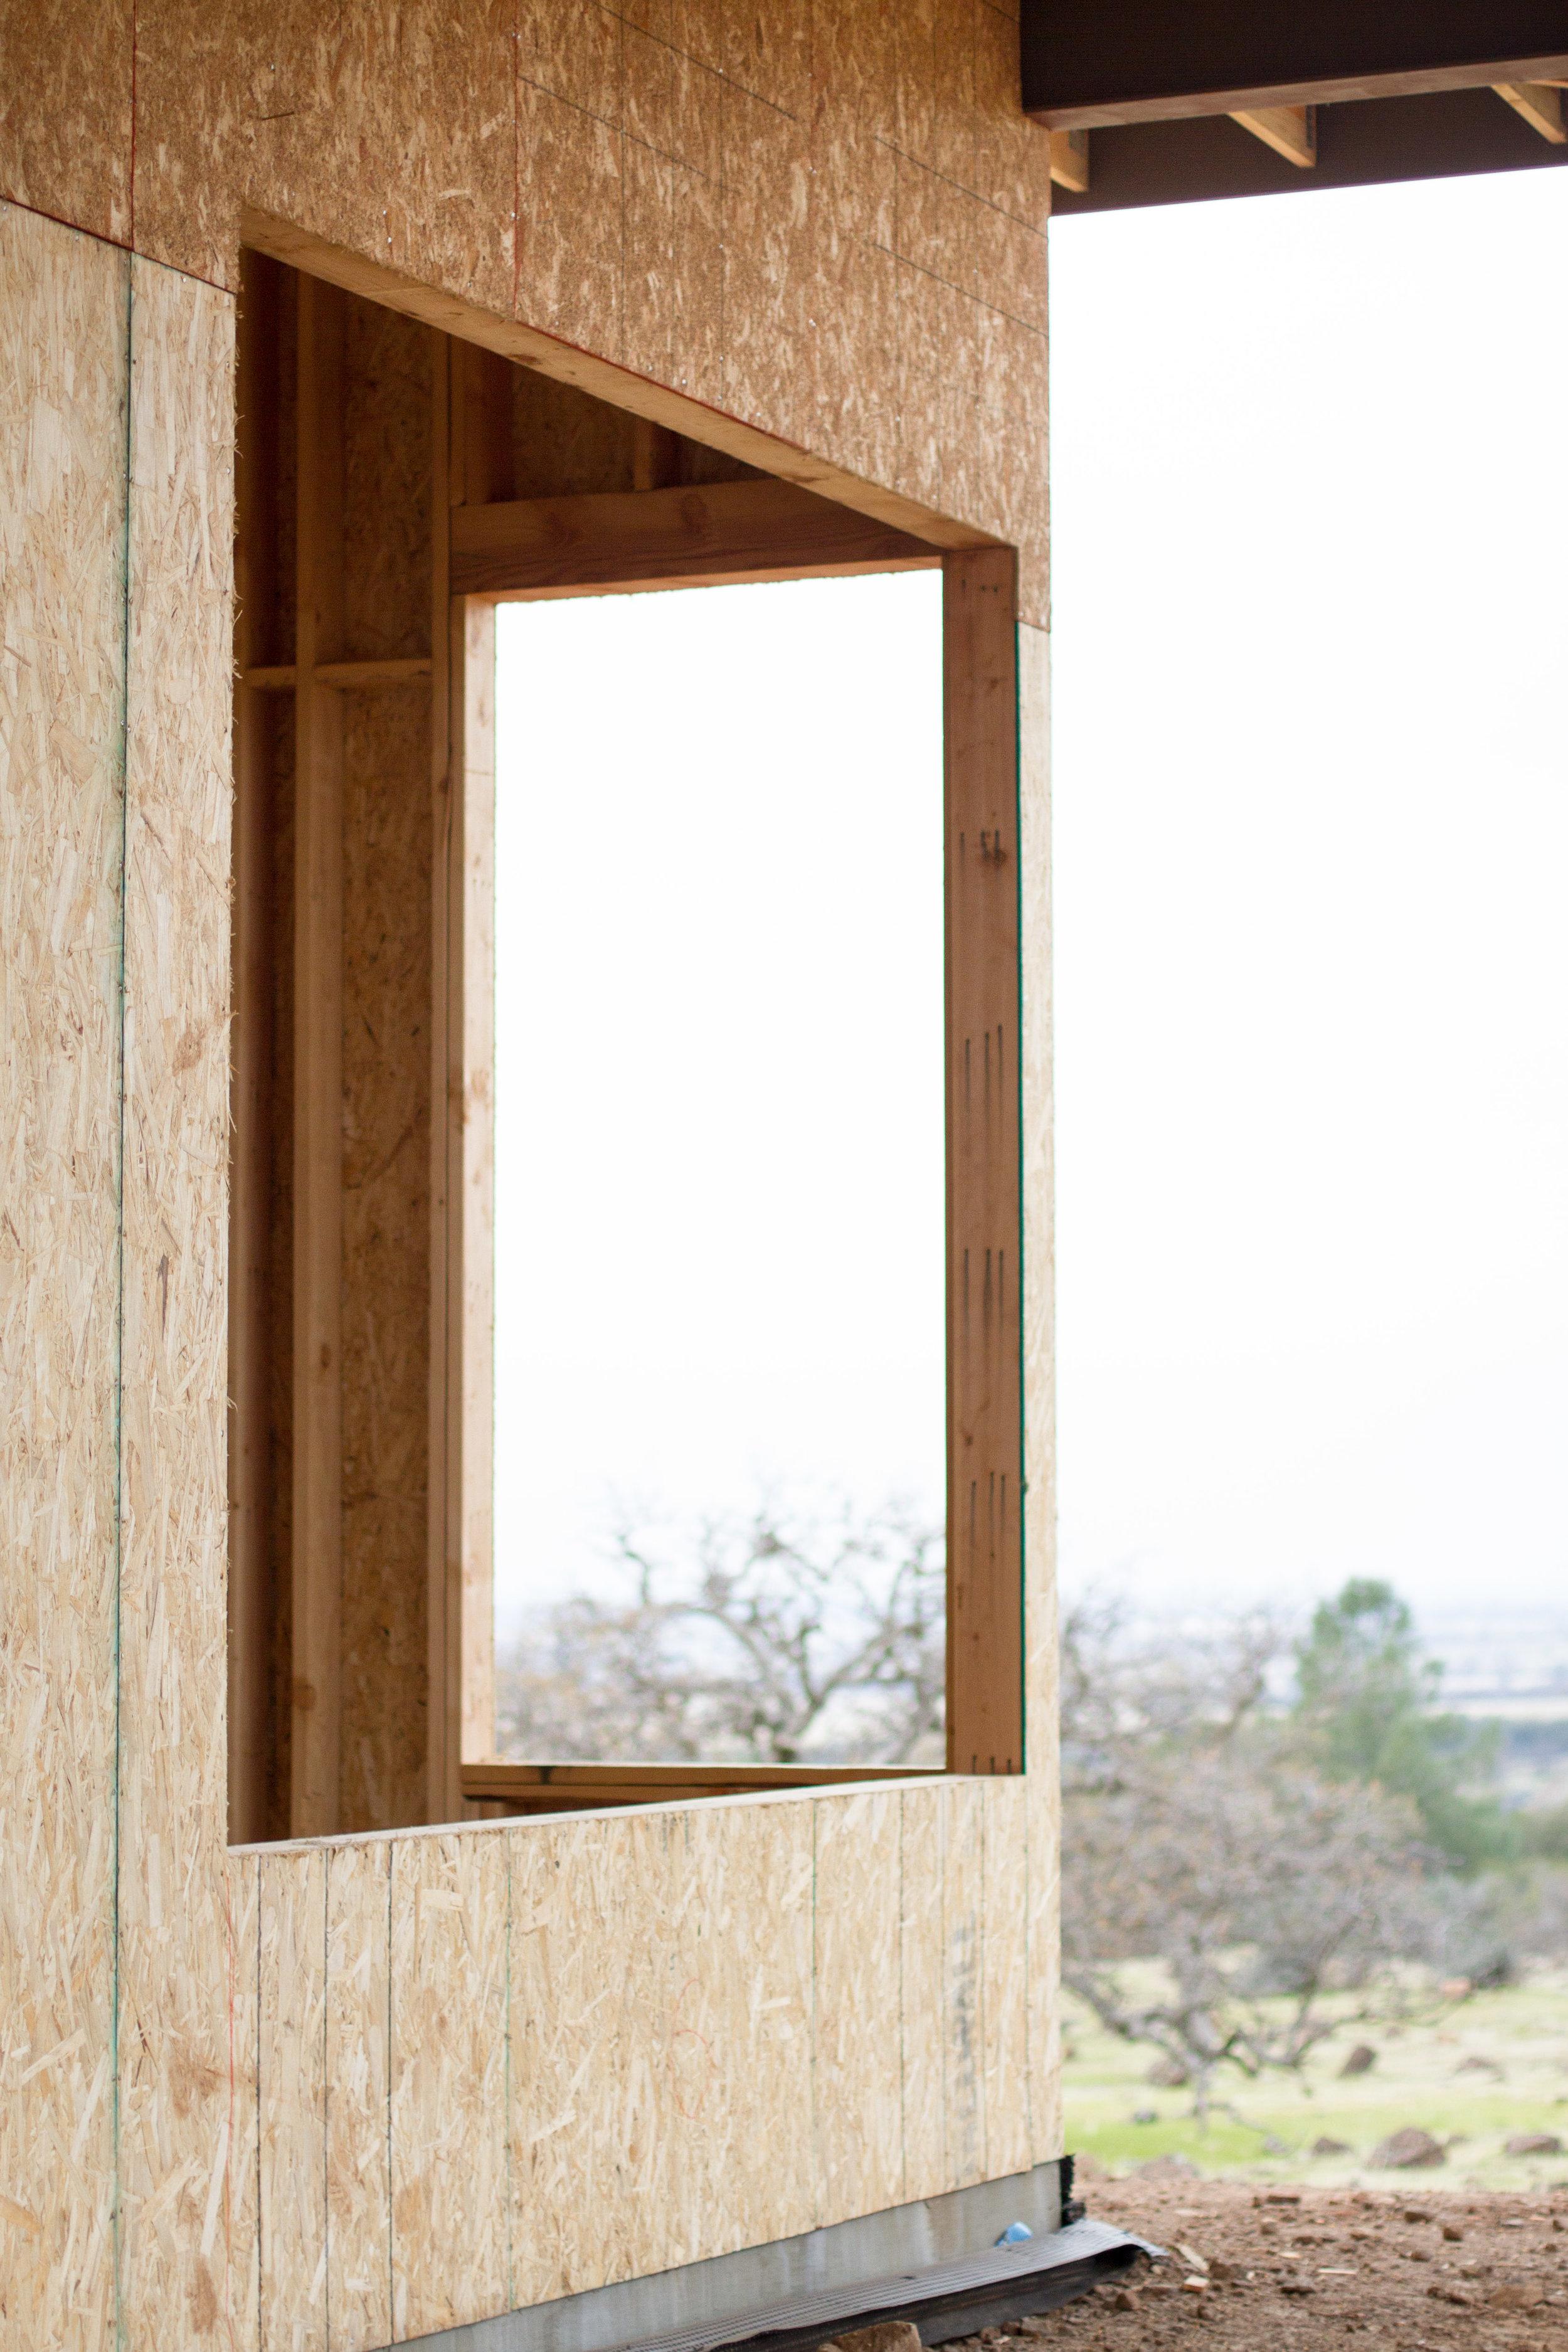 EXTERIOR CORNER WINDOW VIEW